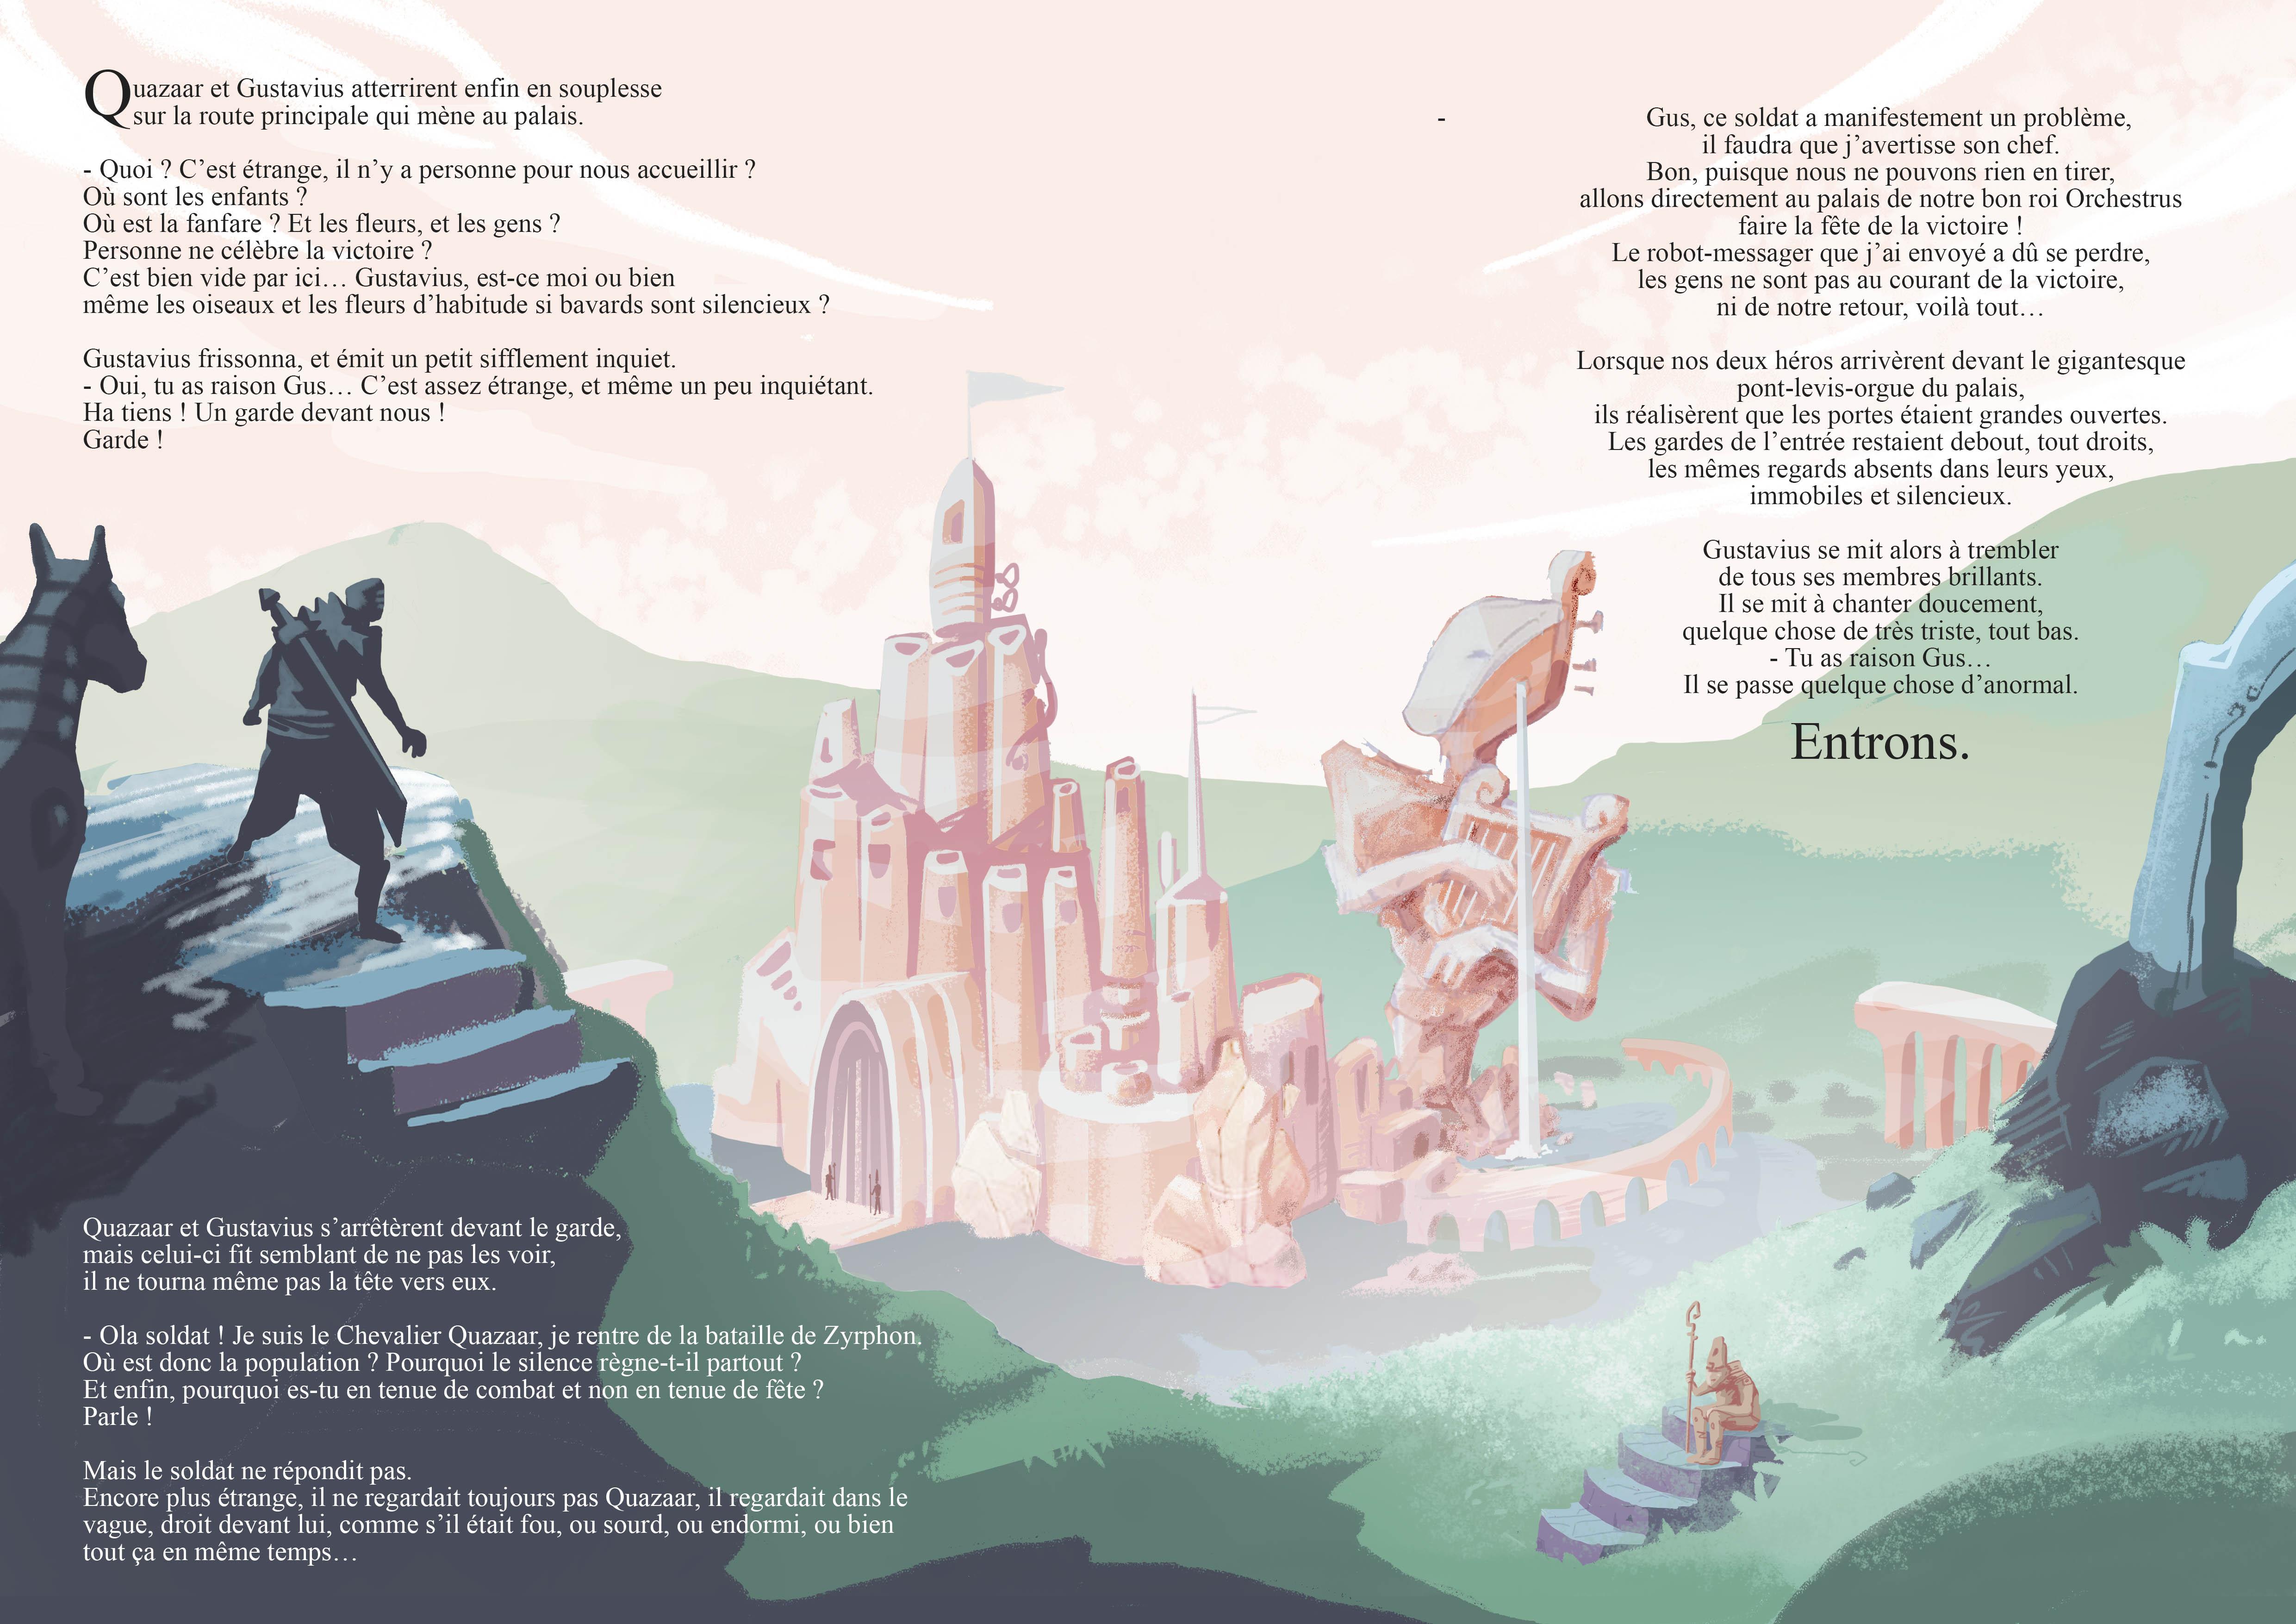 abys-illustration da-lyon rough fantasy word knight